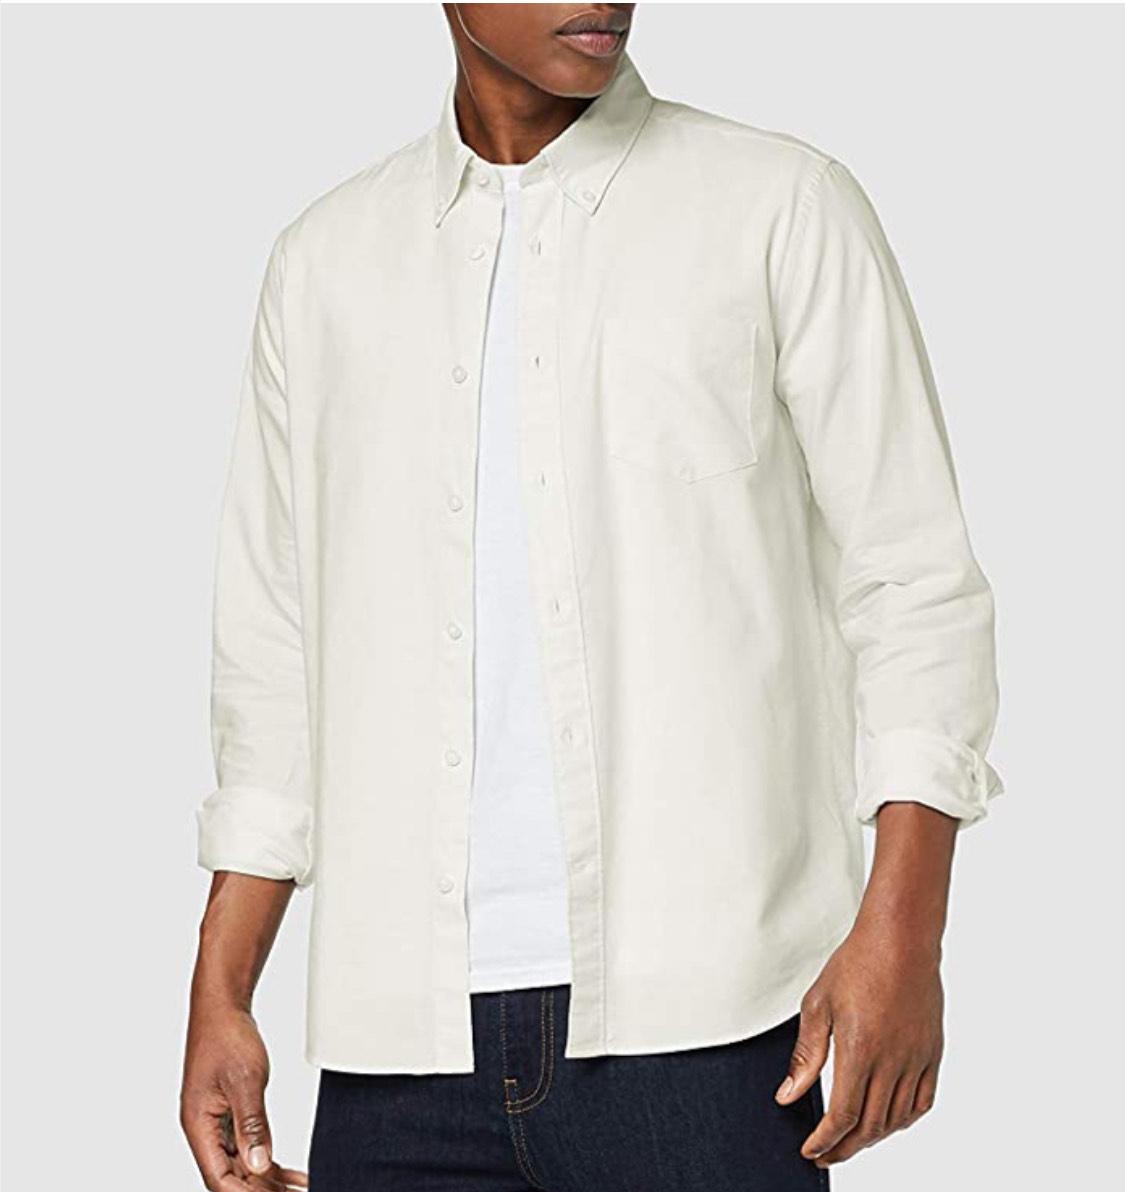 Camisa algodón find. hombre talla S.